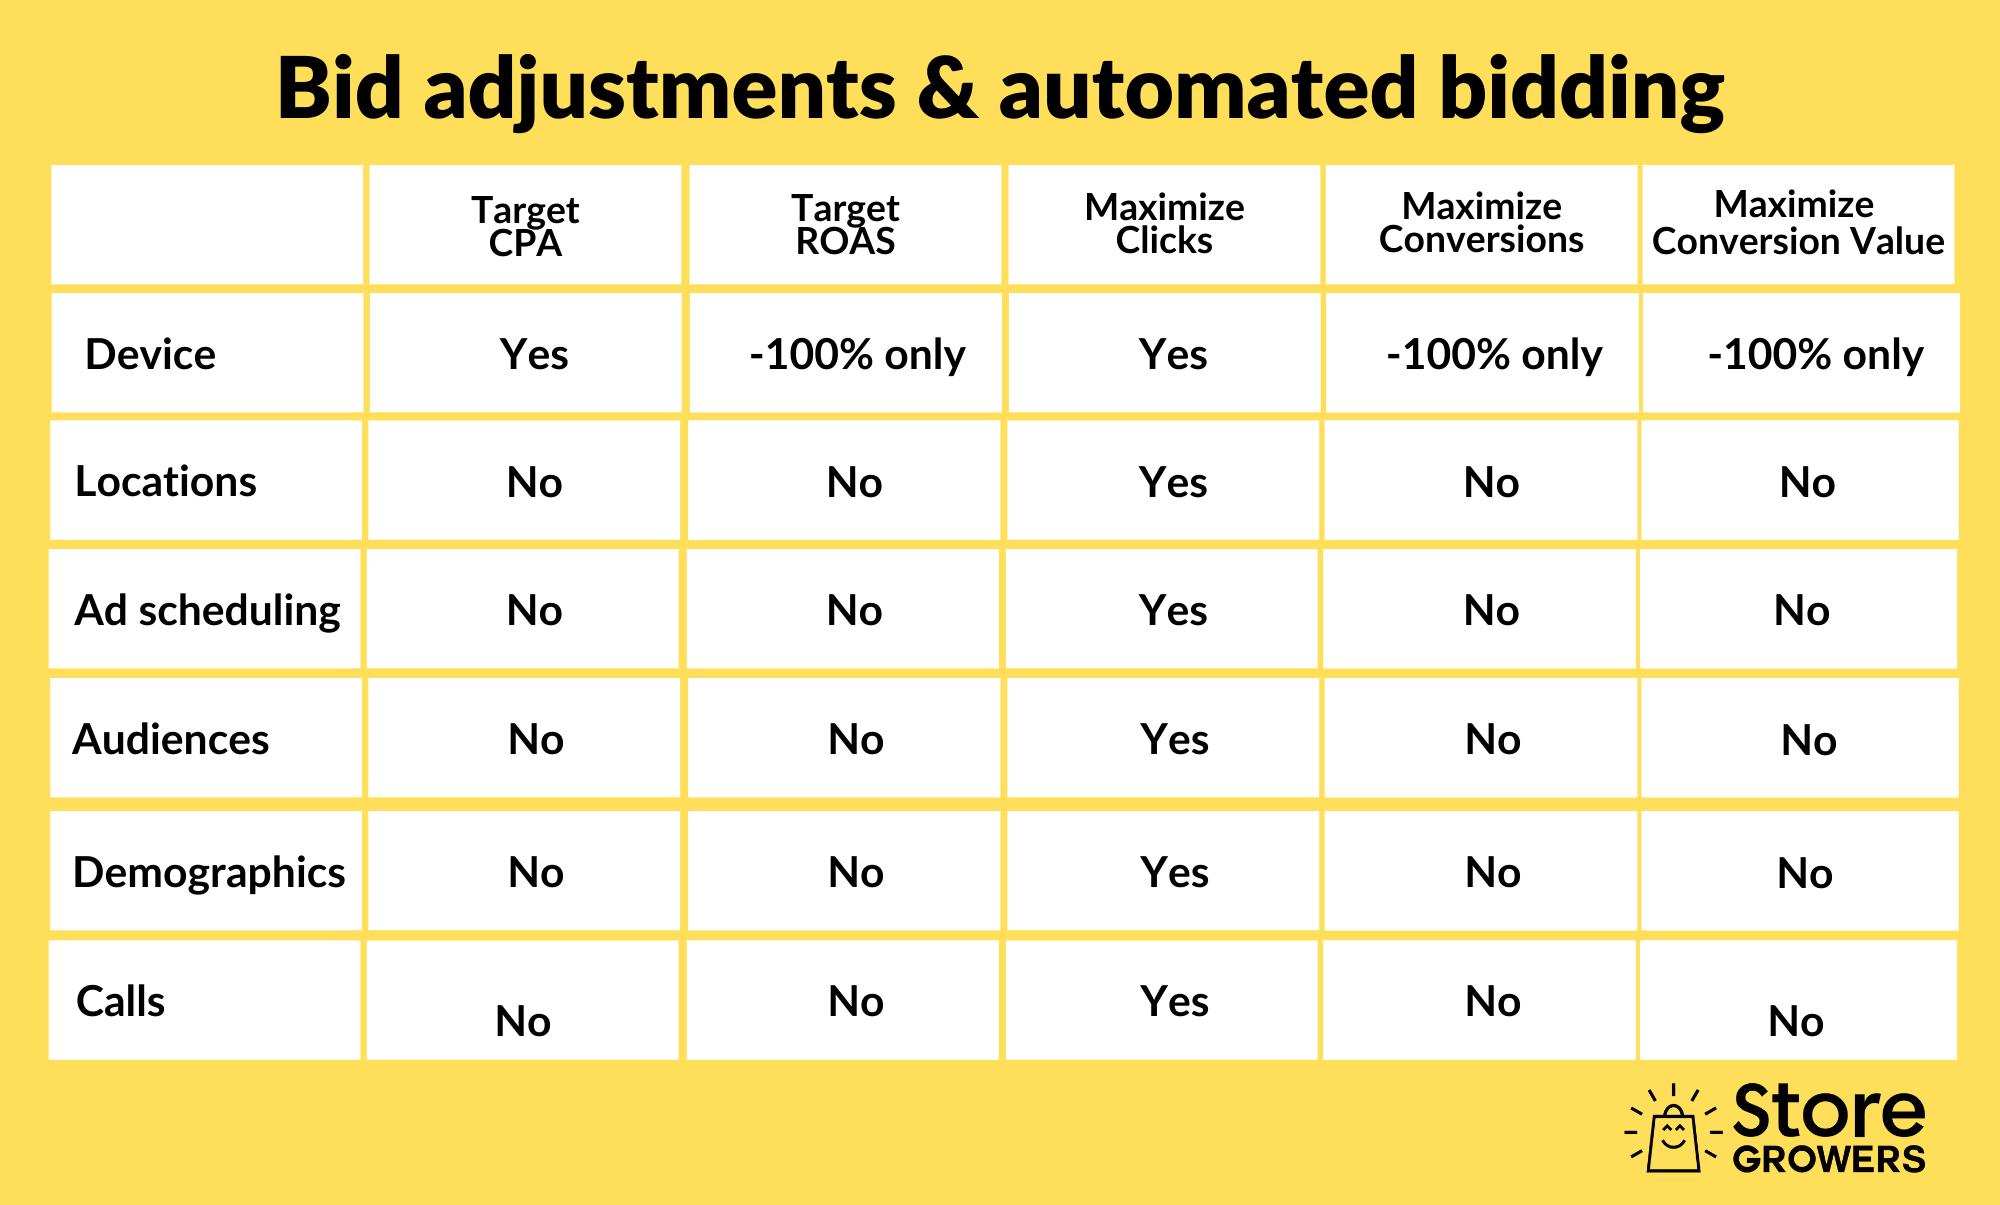 google-ads-bid-adjustments-automated-bidding